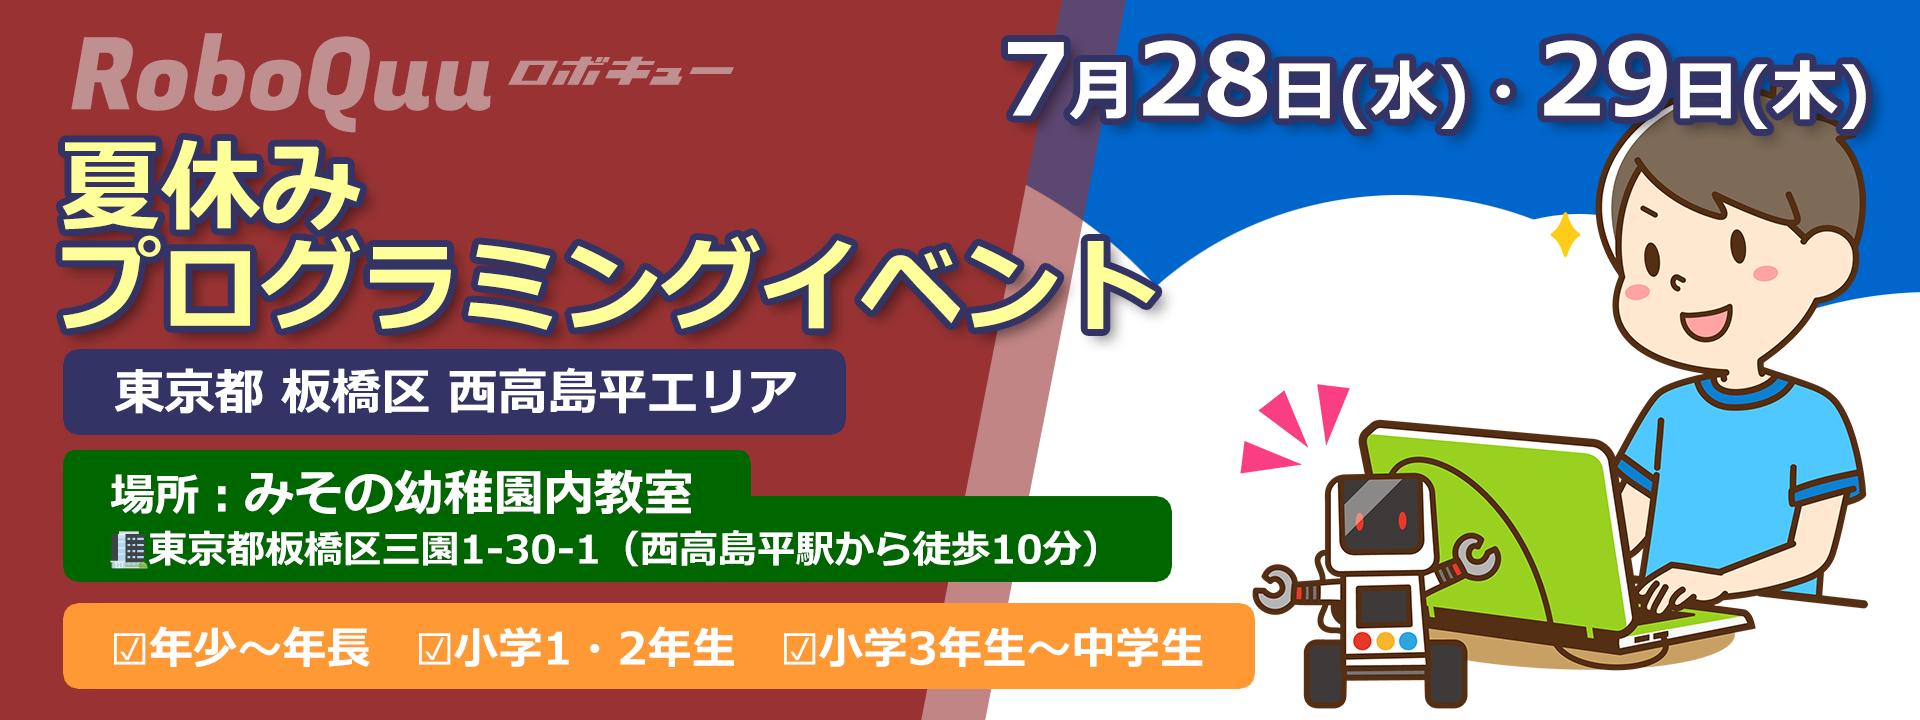 RoboQuu教室<夏休みプログラミングイベント>東京都 板橋区 西高島平エリア(みその校)